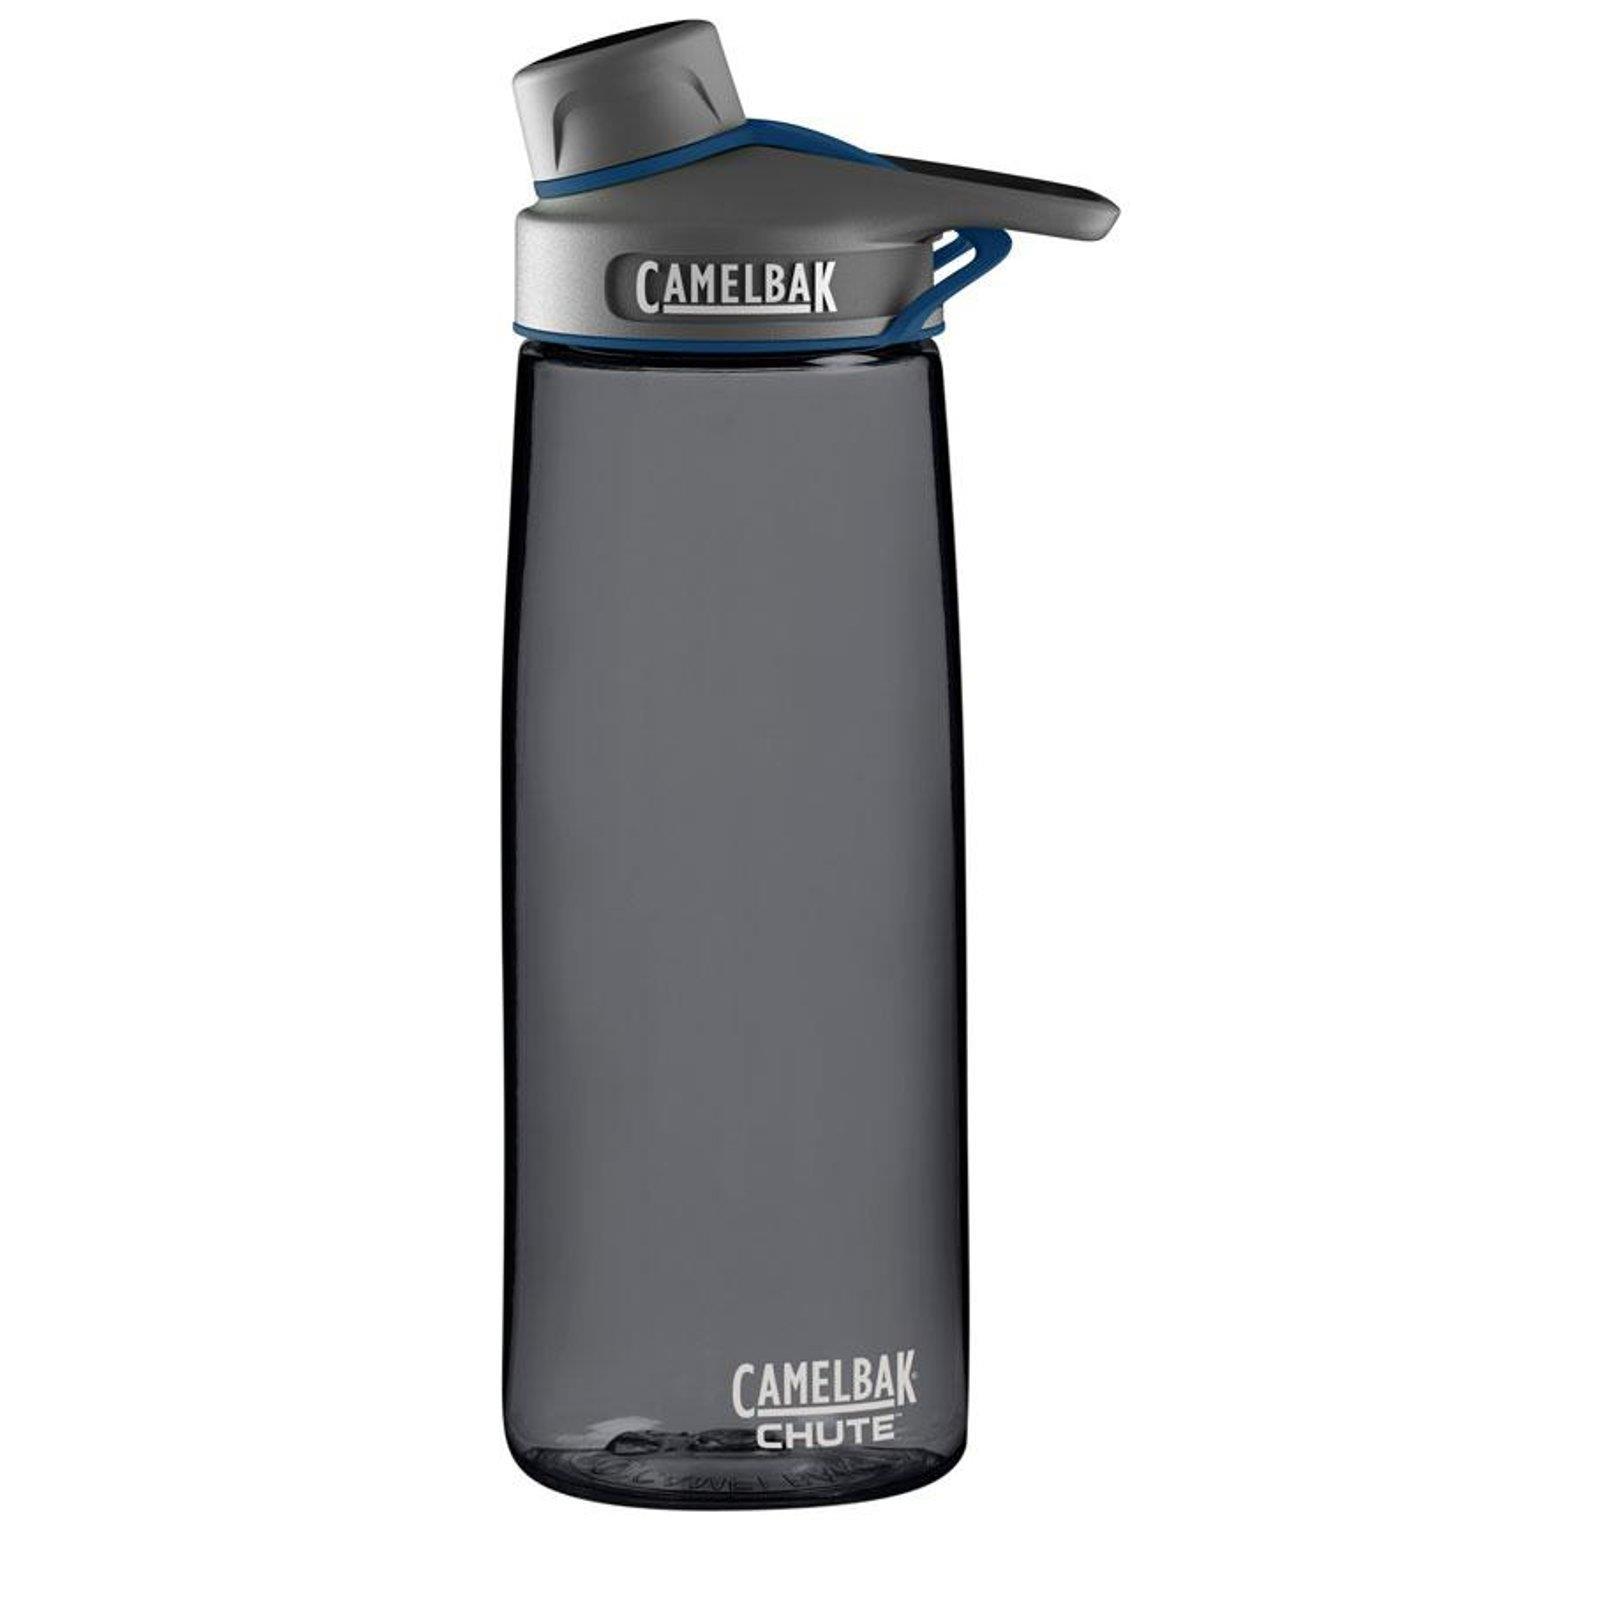 camelbak trinkflasche chute 750 ml wasser flasche. Black Bedroom Furniture Sets. Home Design Ideas